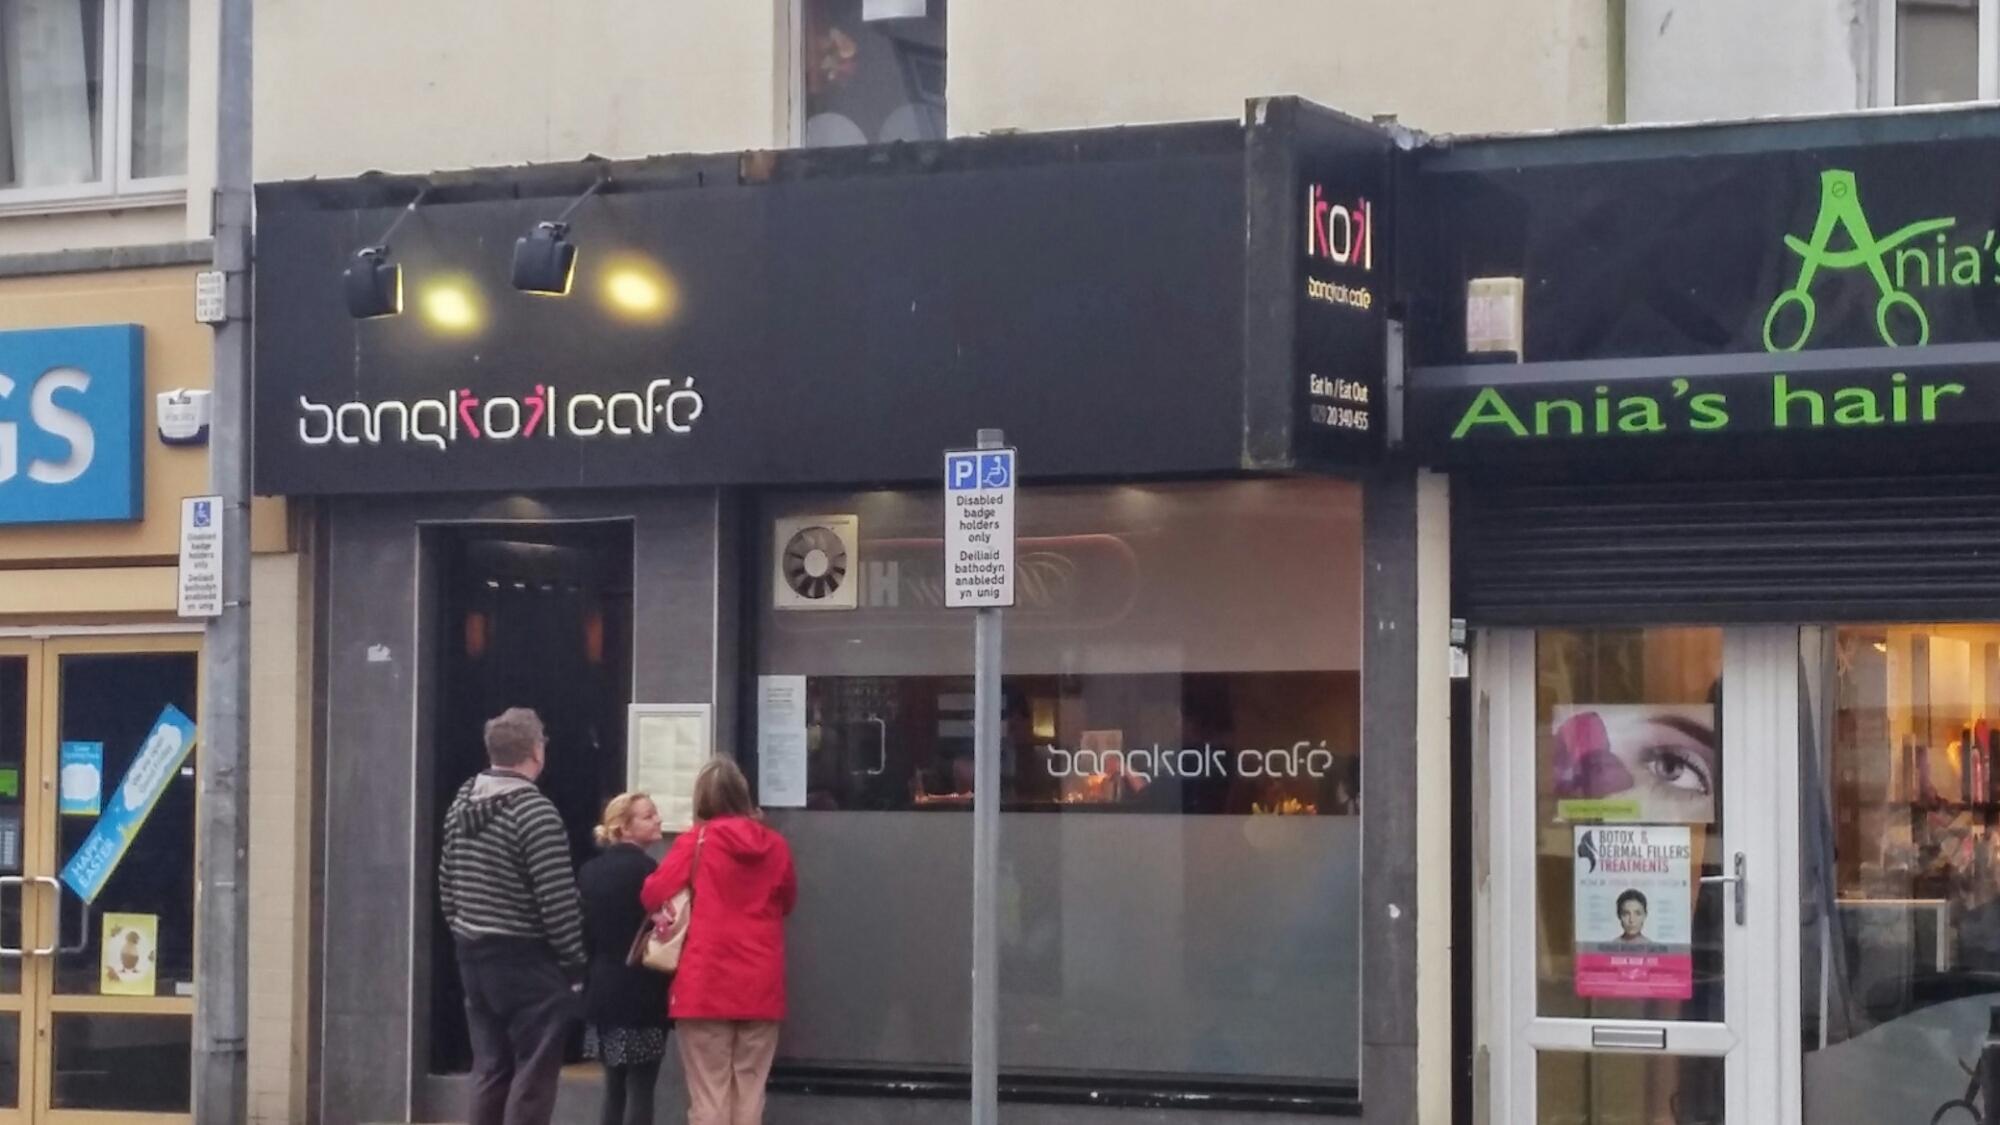 Bangkok Cafe Cardiff Review